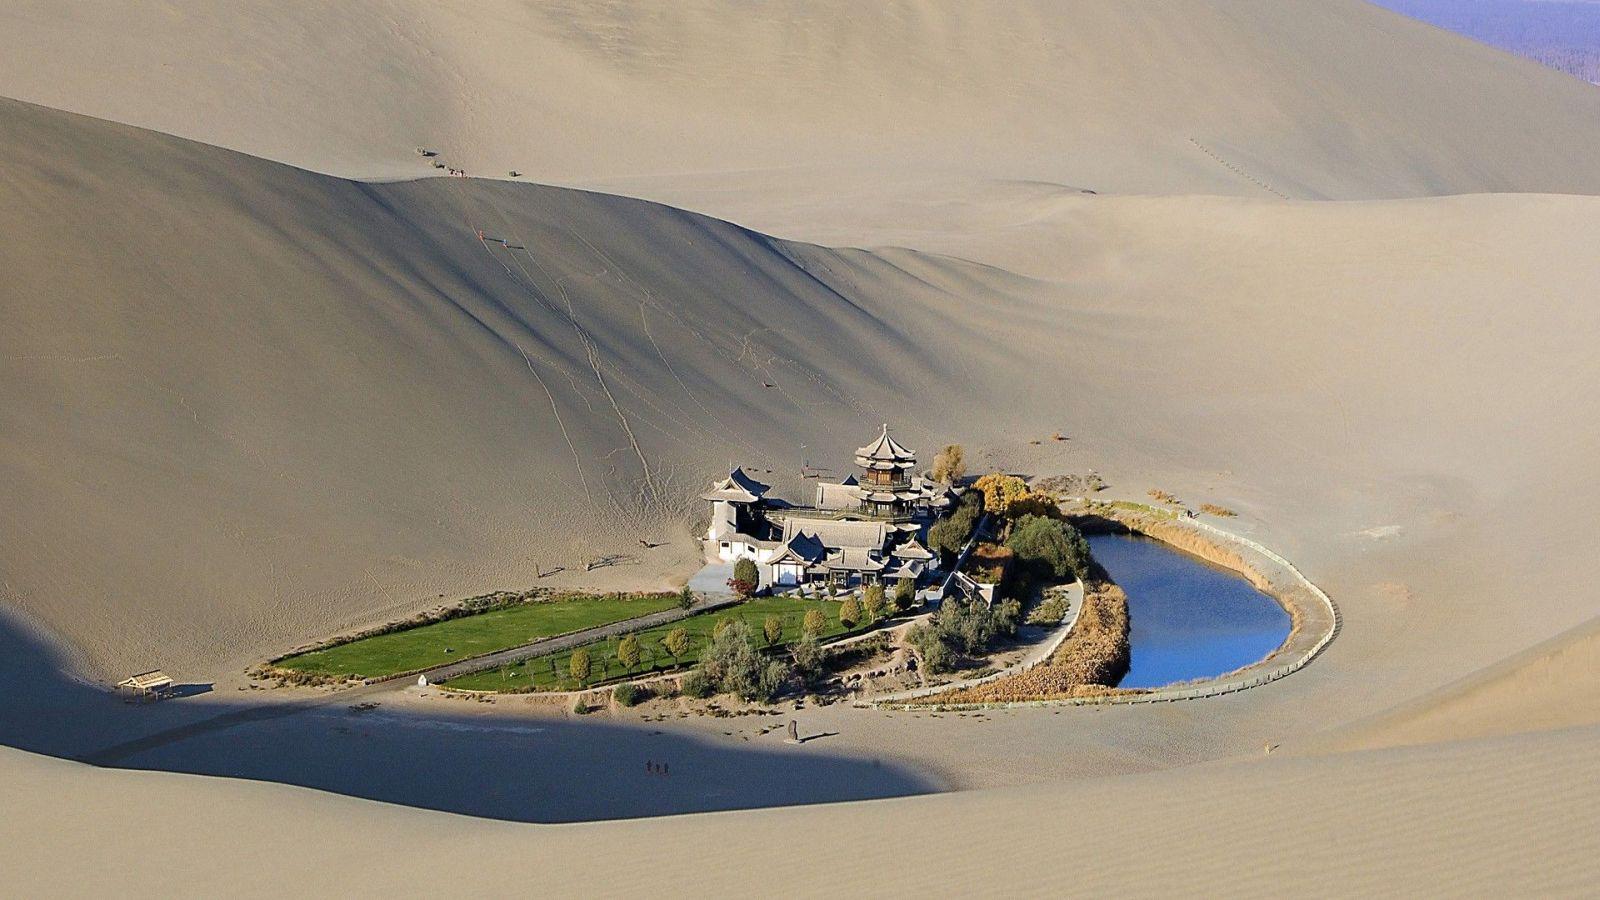 oasis-milieu-desert